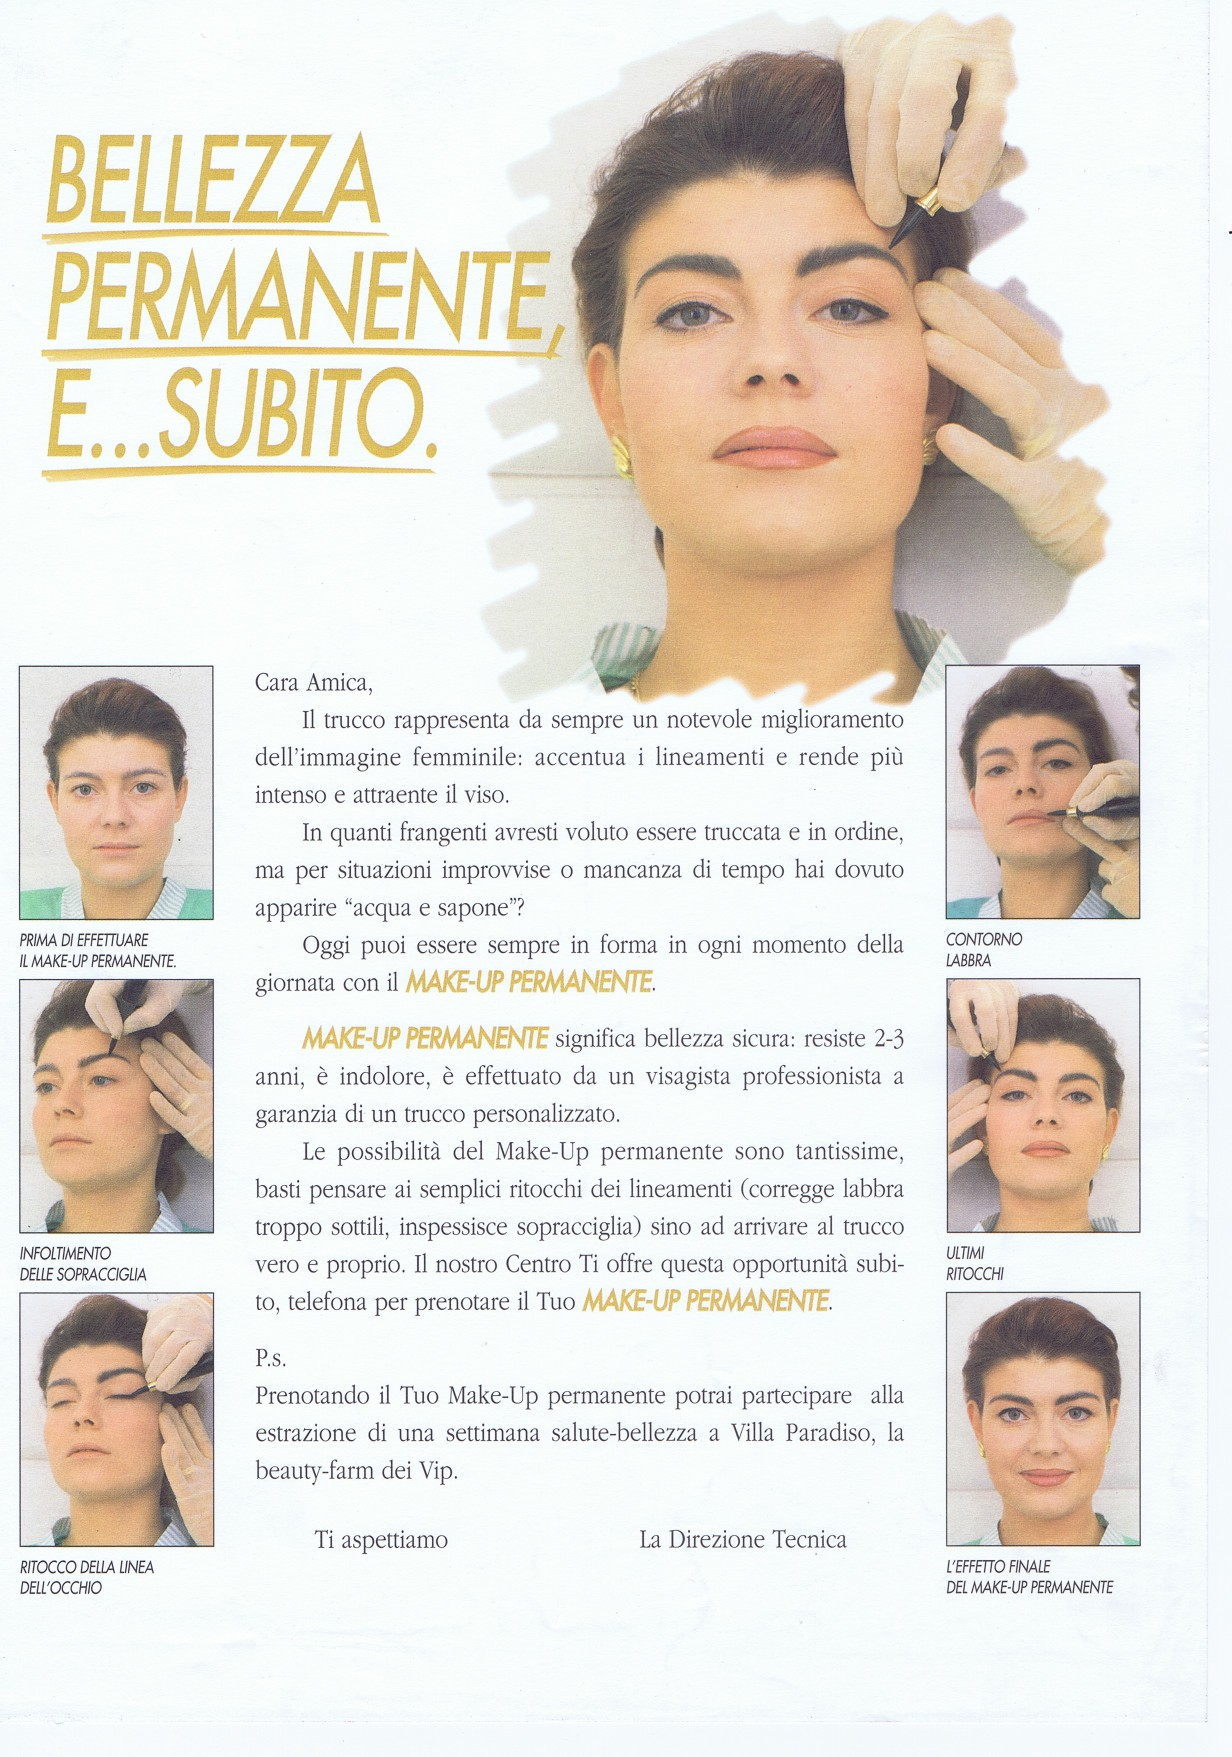 Volantino Integree 1995